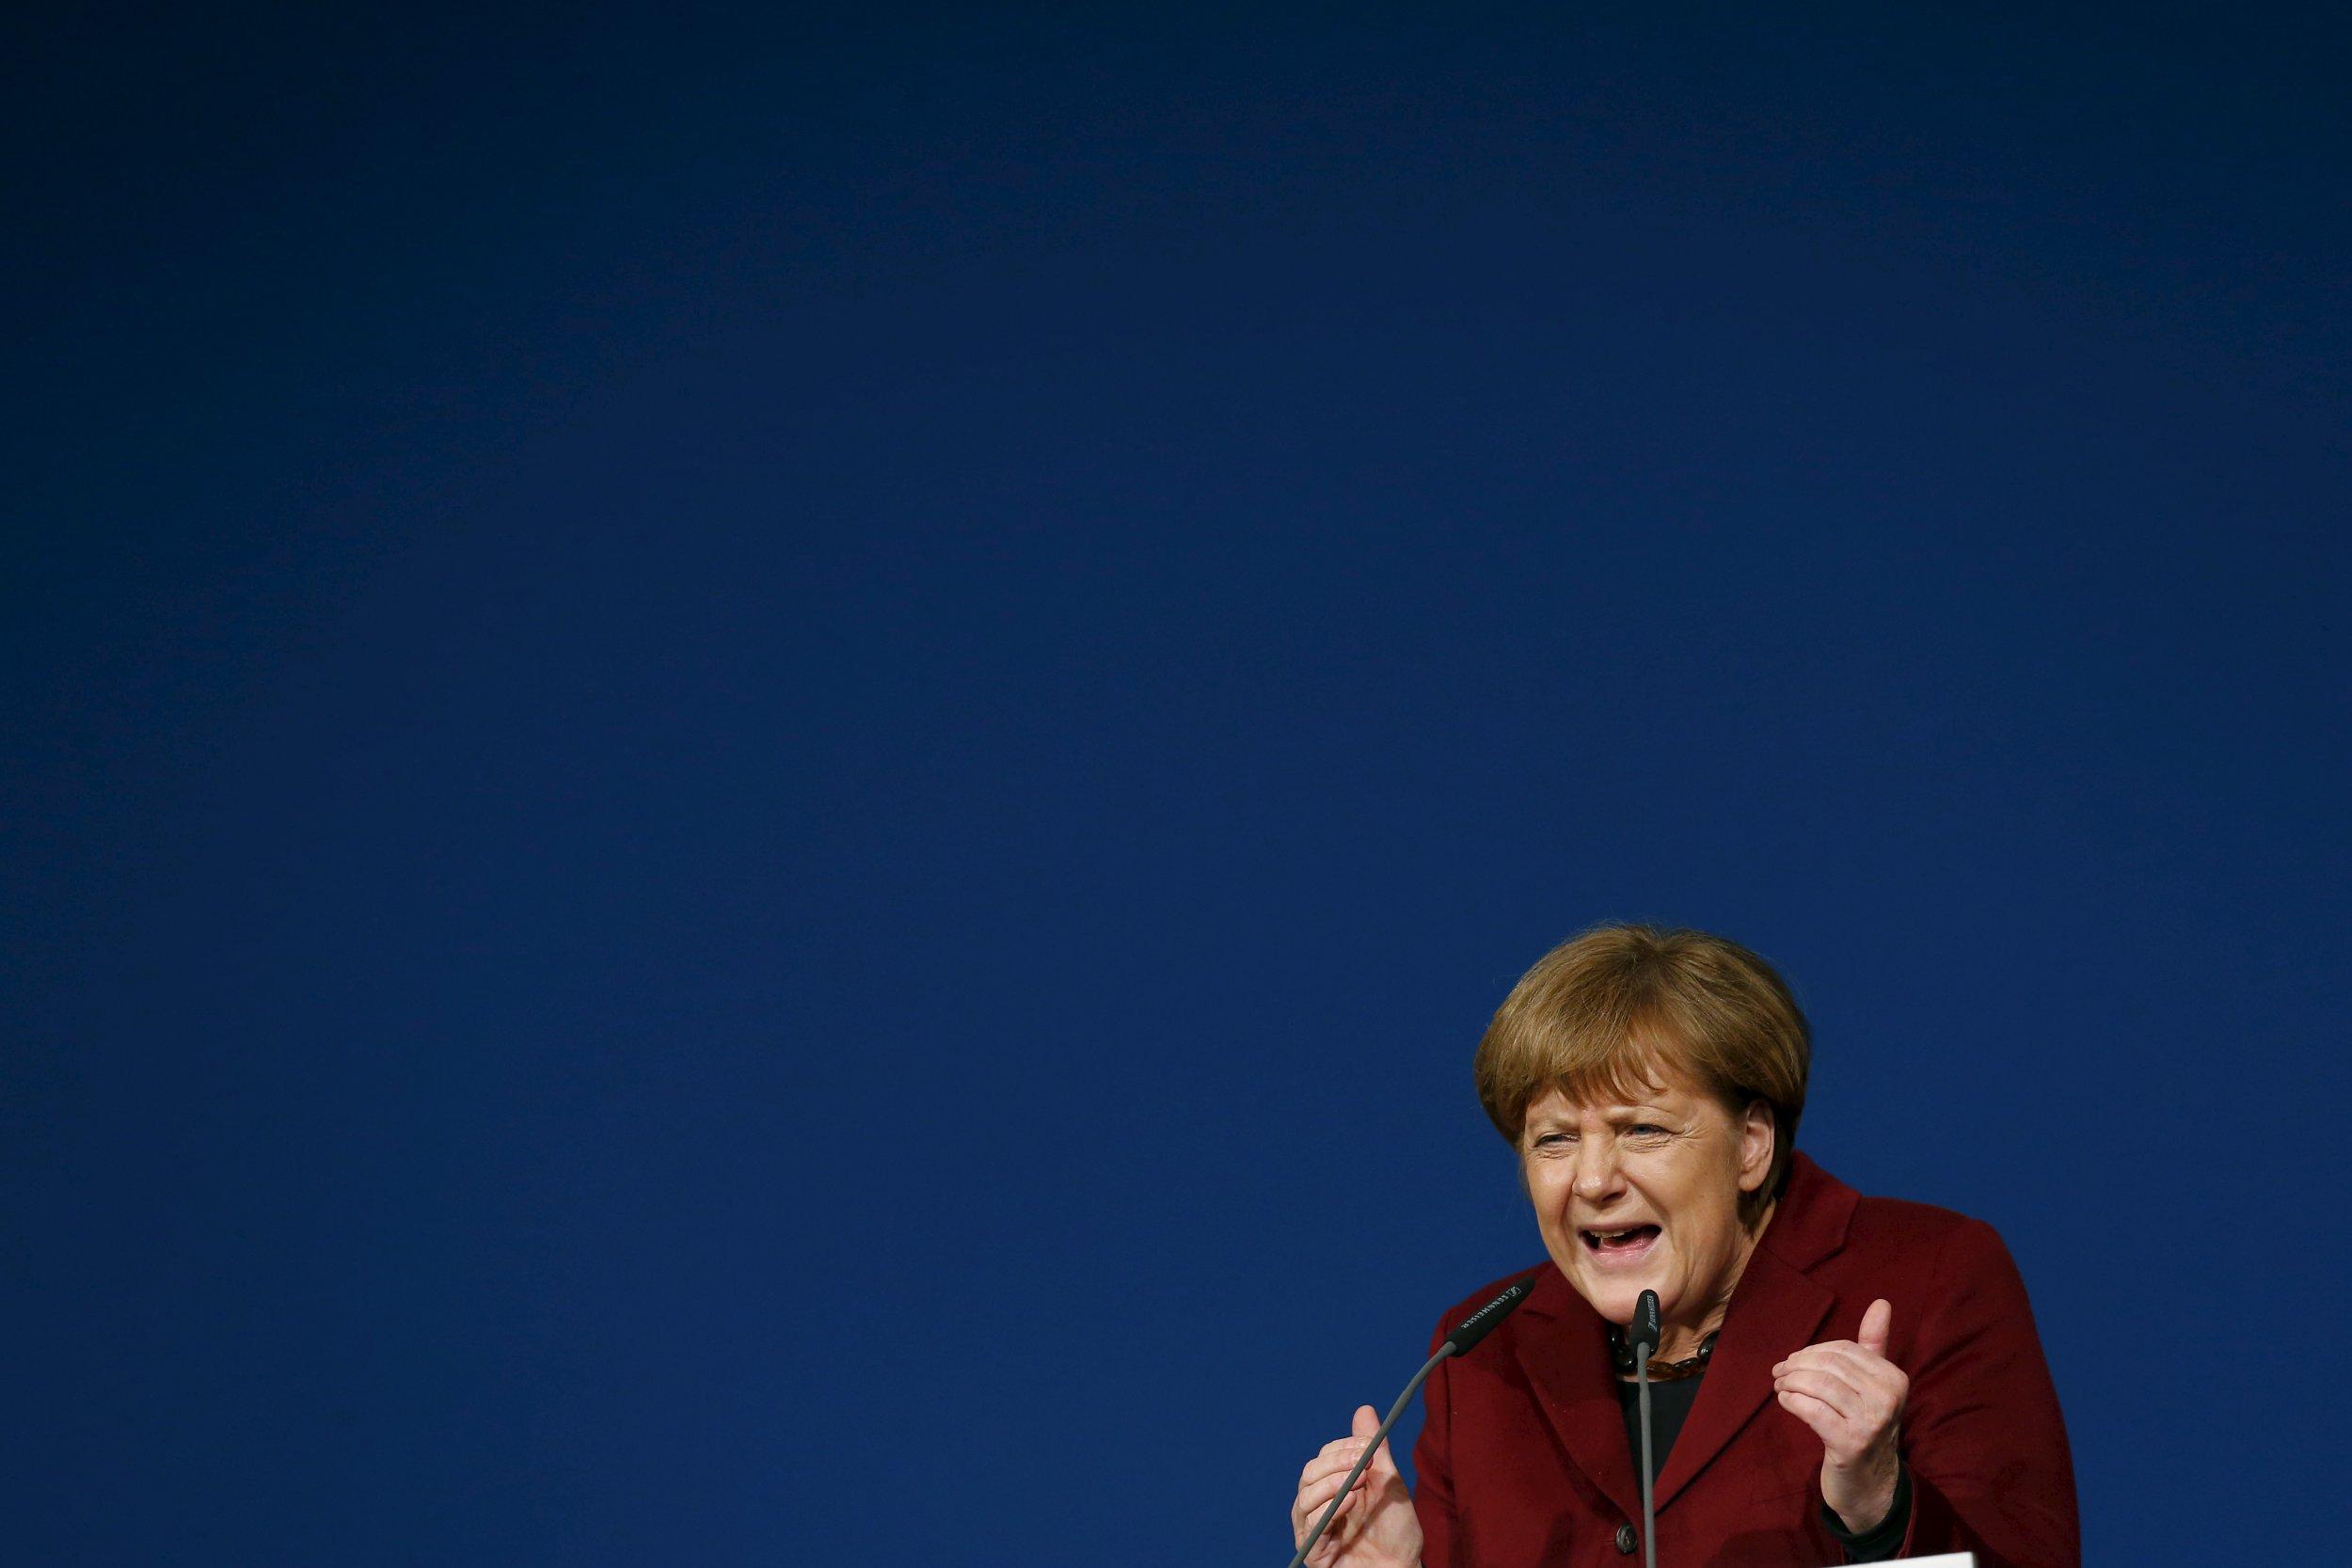 02_24_Merkel_Isolated_01